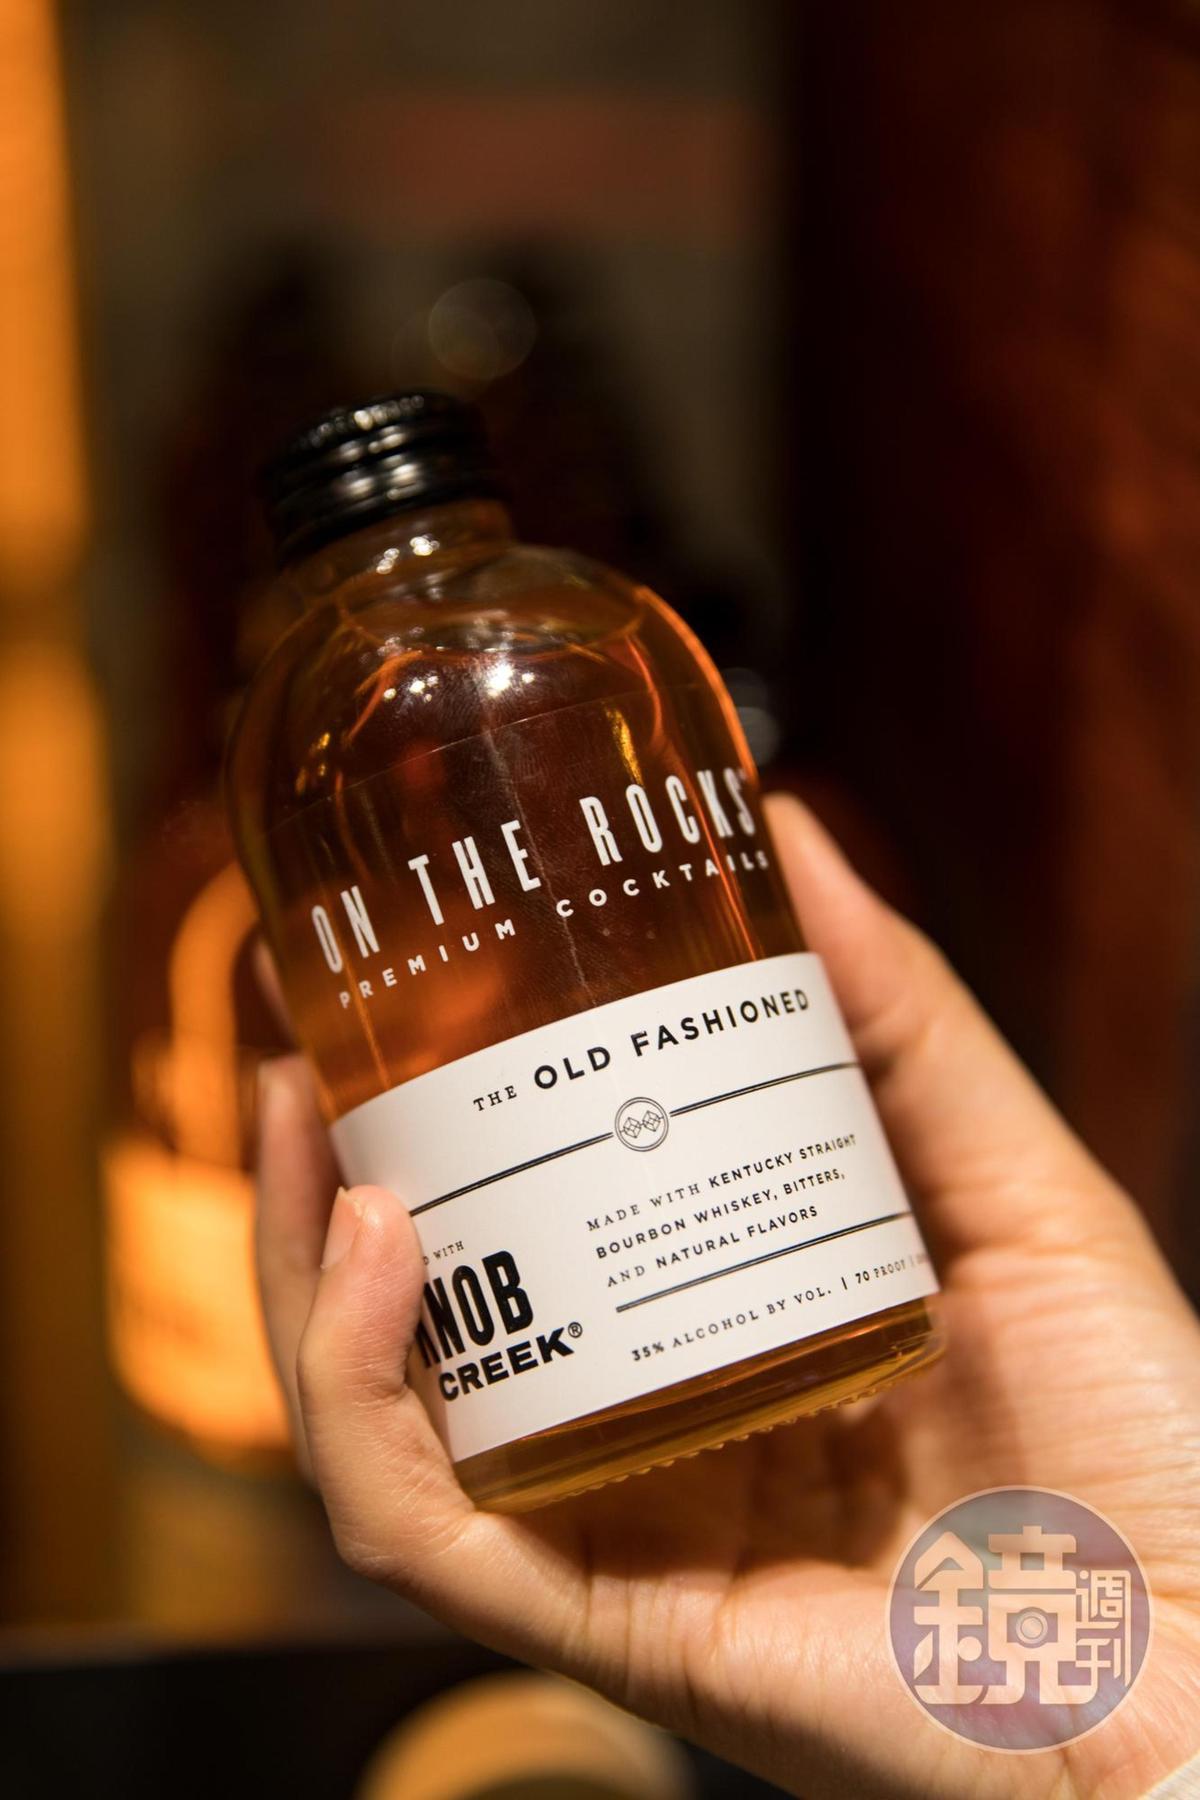 Knob Creek也推出時下流行的瓶裝調酒Old Fashioned。